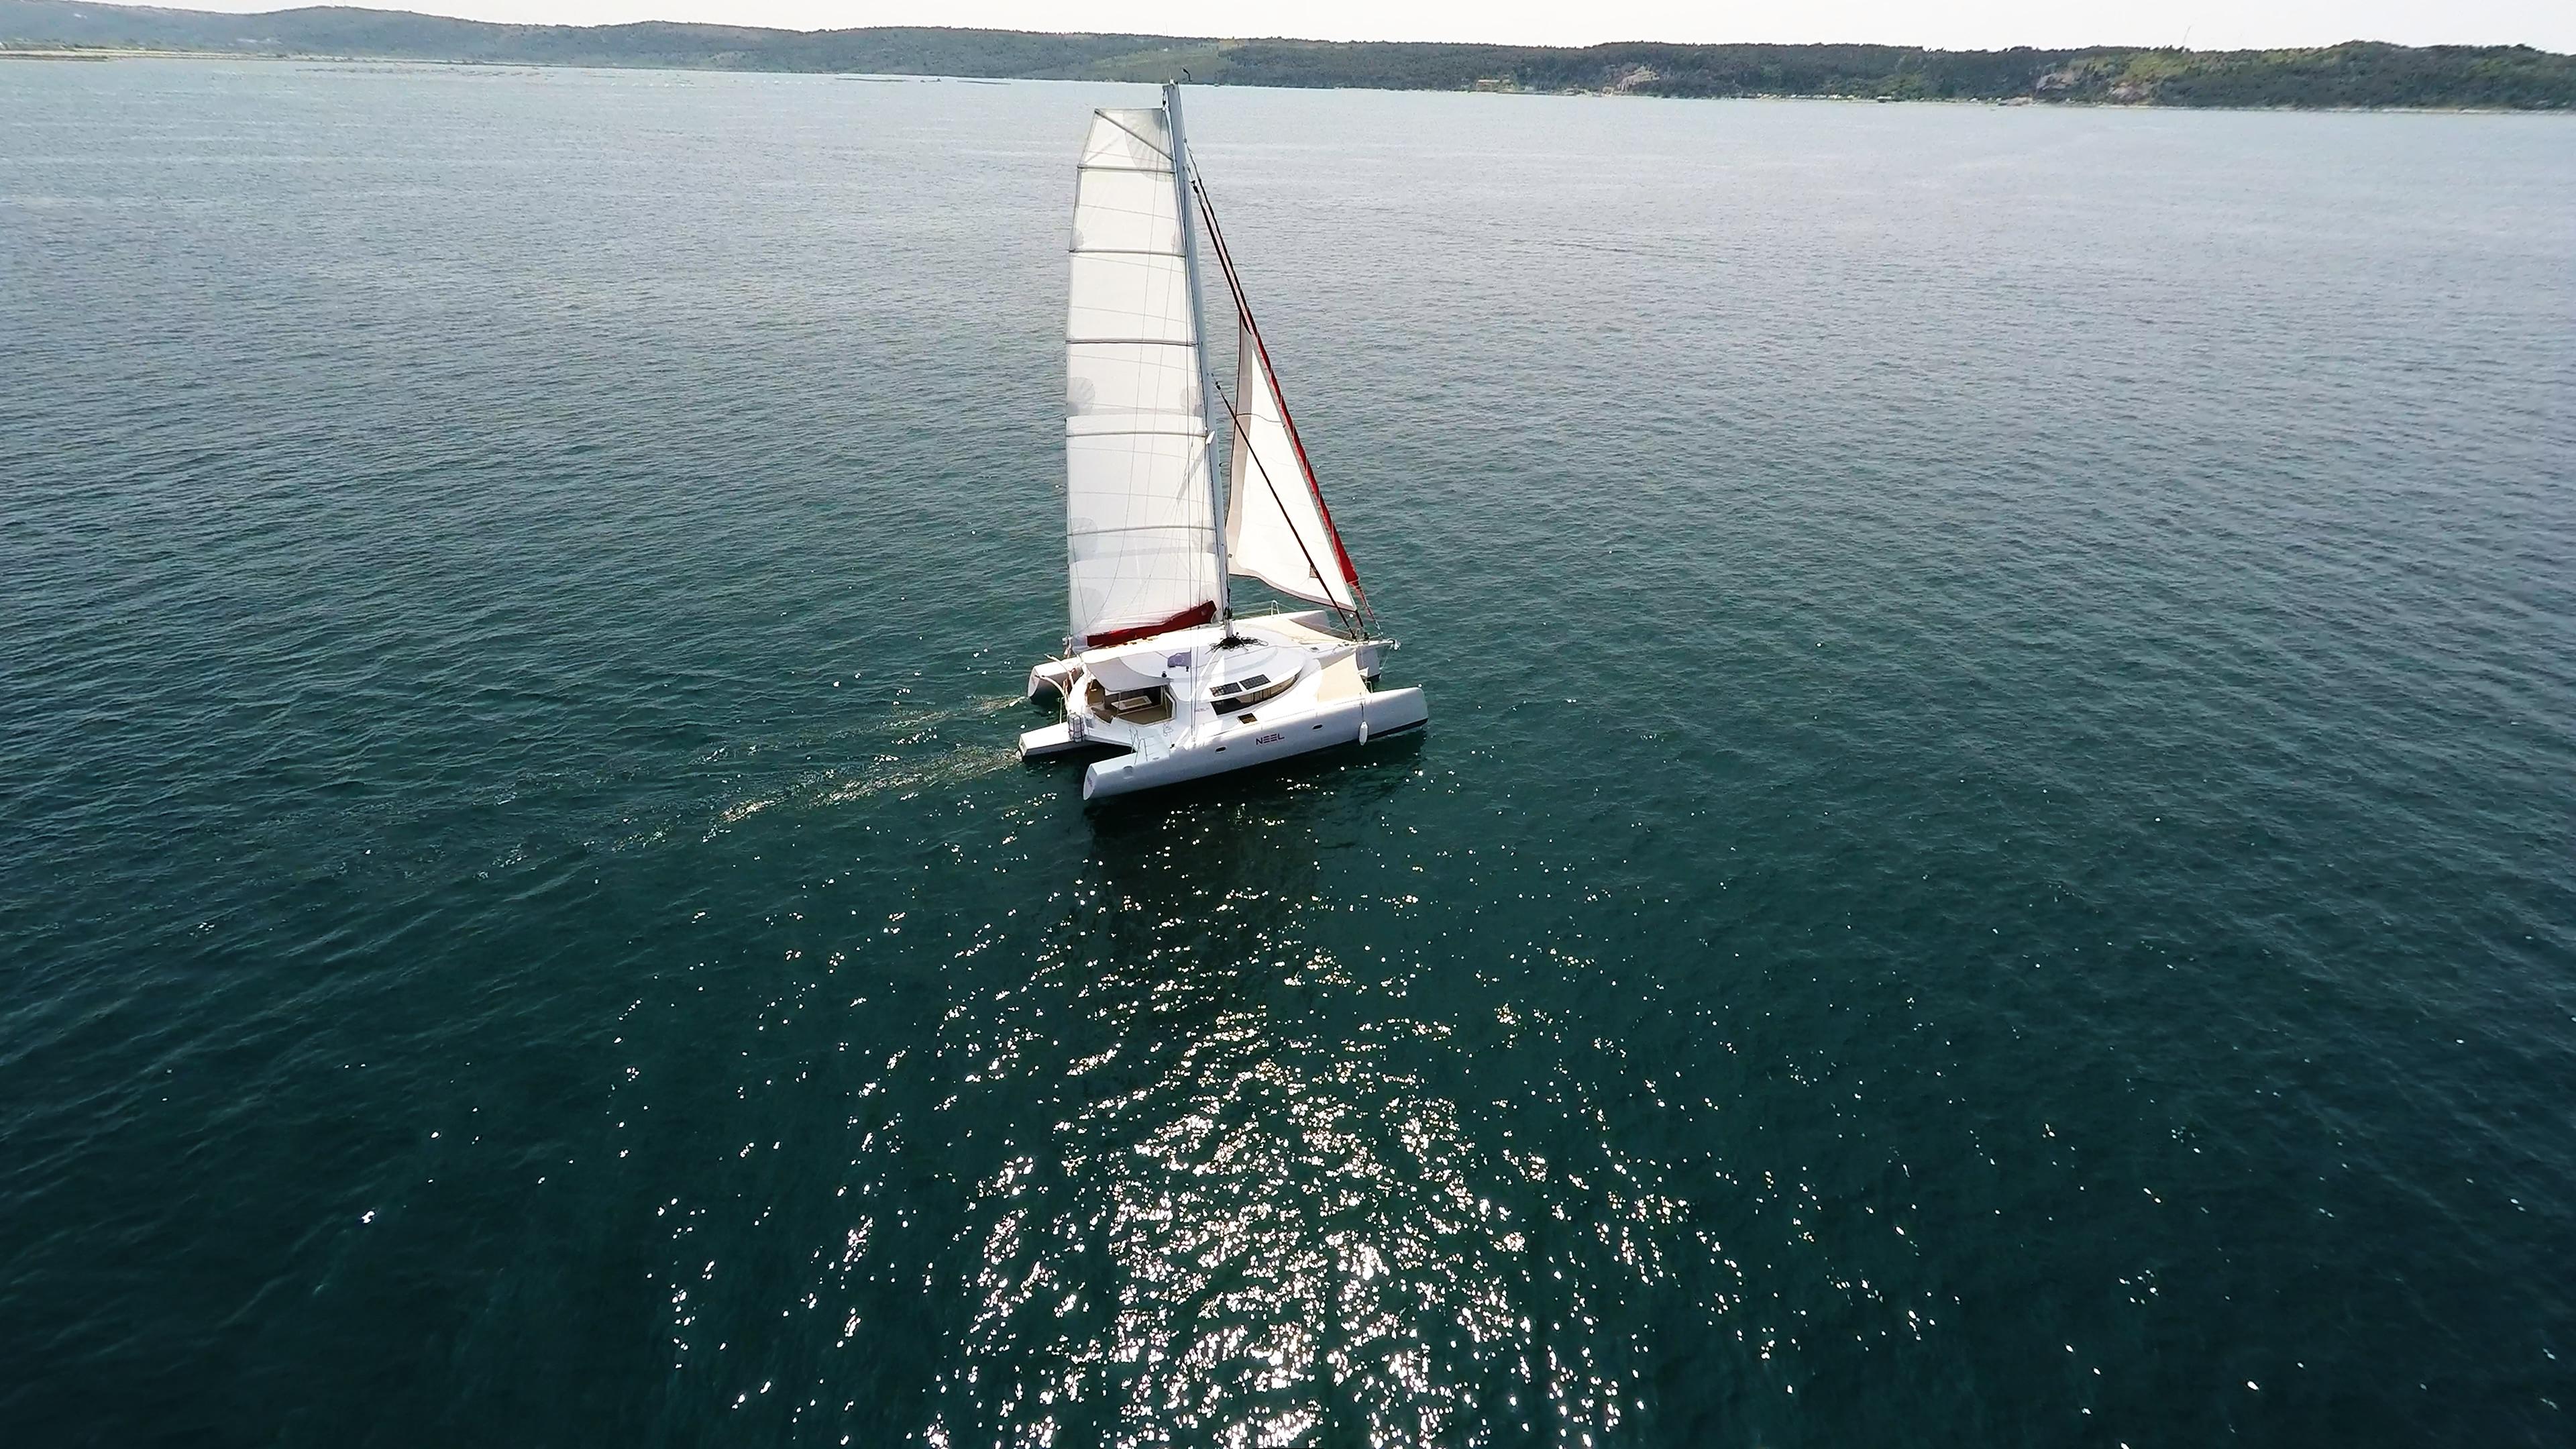 trimarano naviga a vela foto aerea